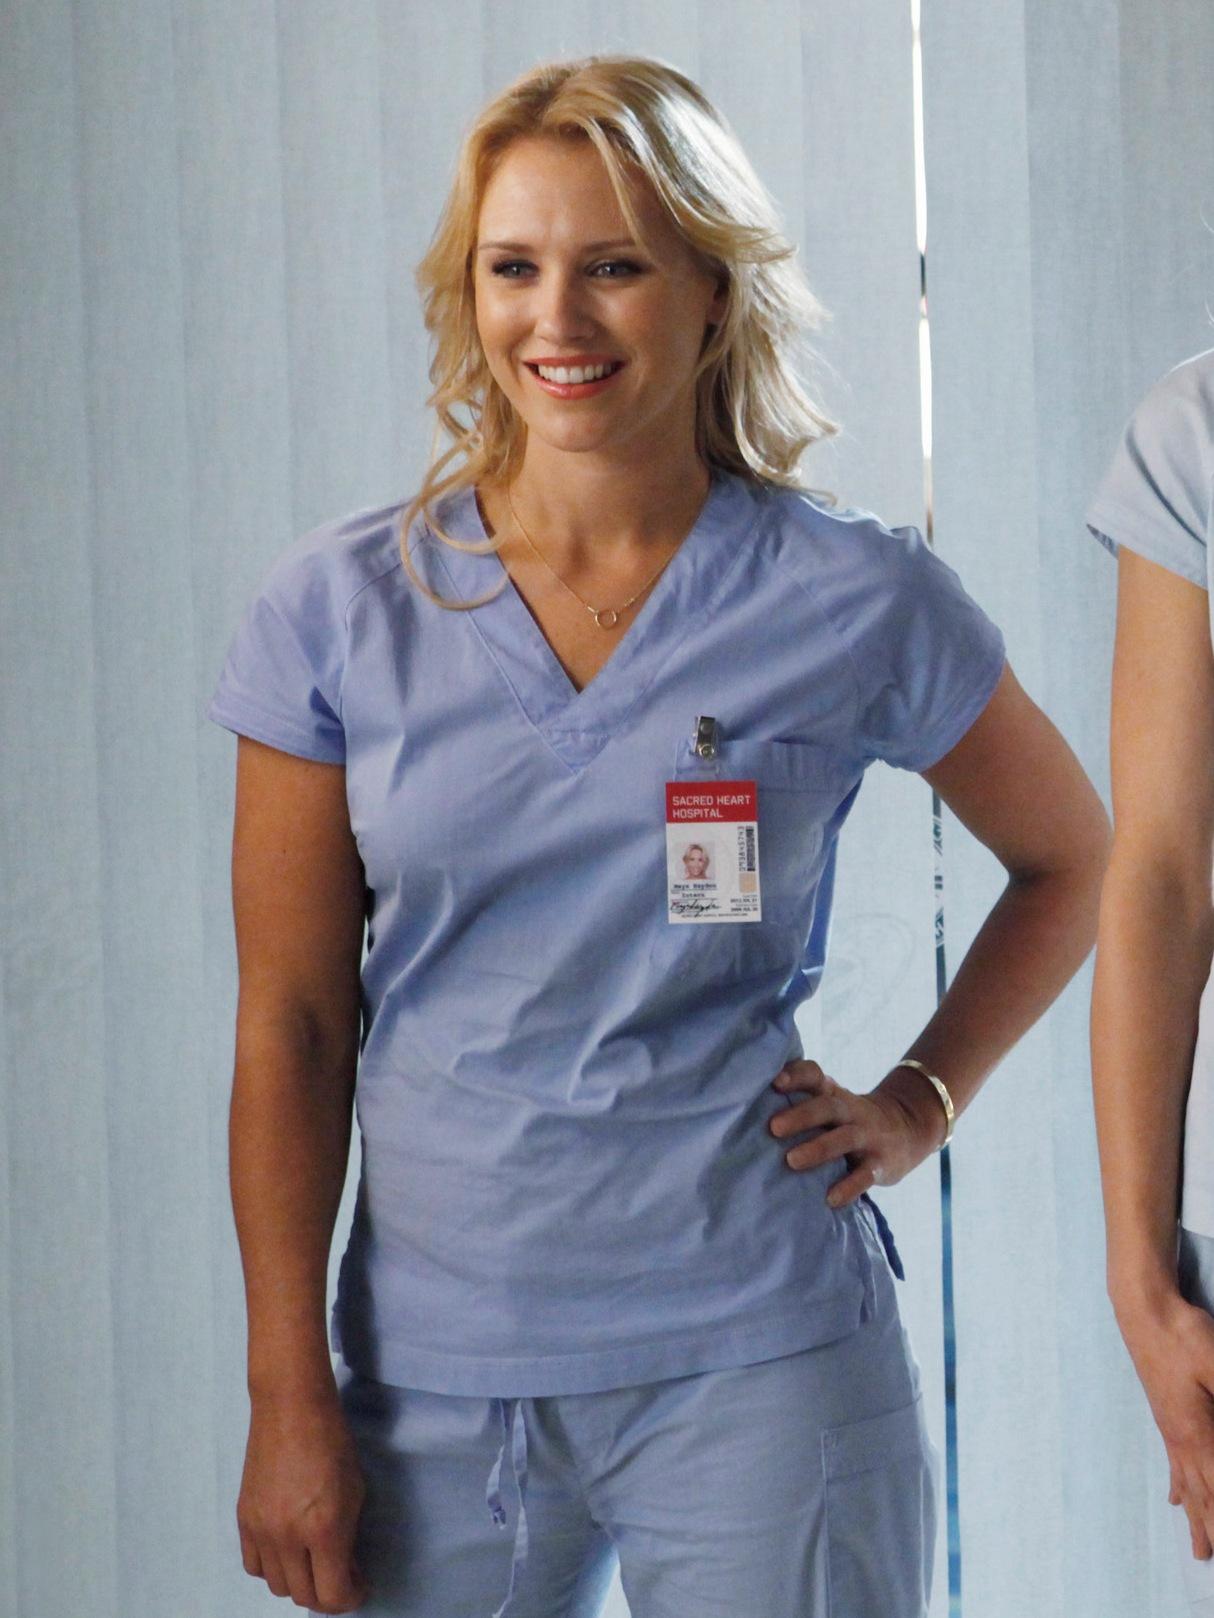 Nicky Whelan in Scrubs